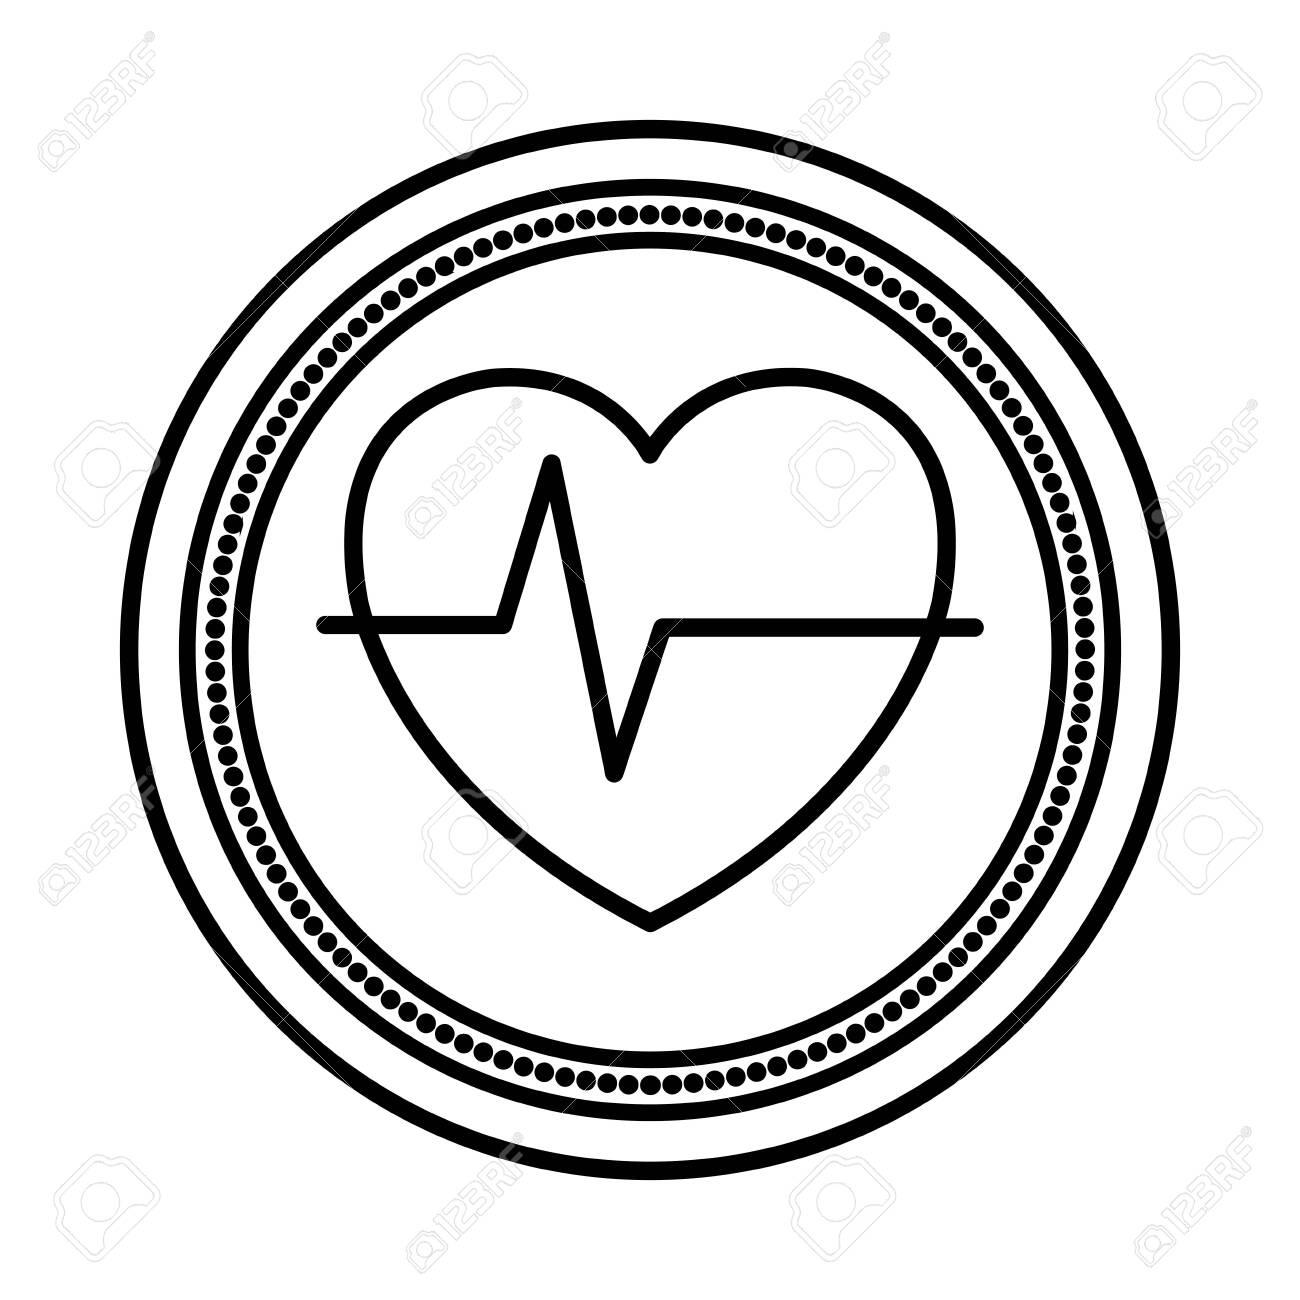 heart cardio medical isolated icon vector illustration design - 130501078